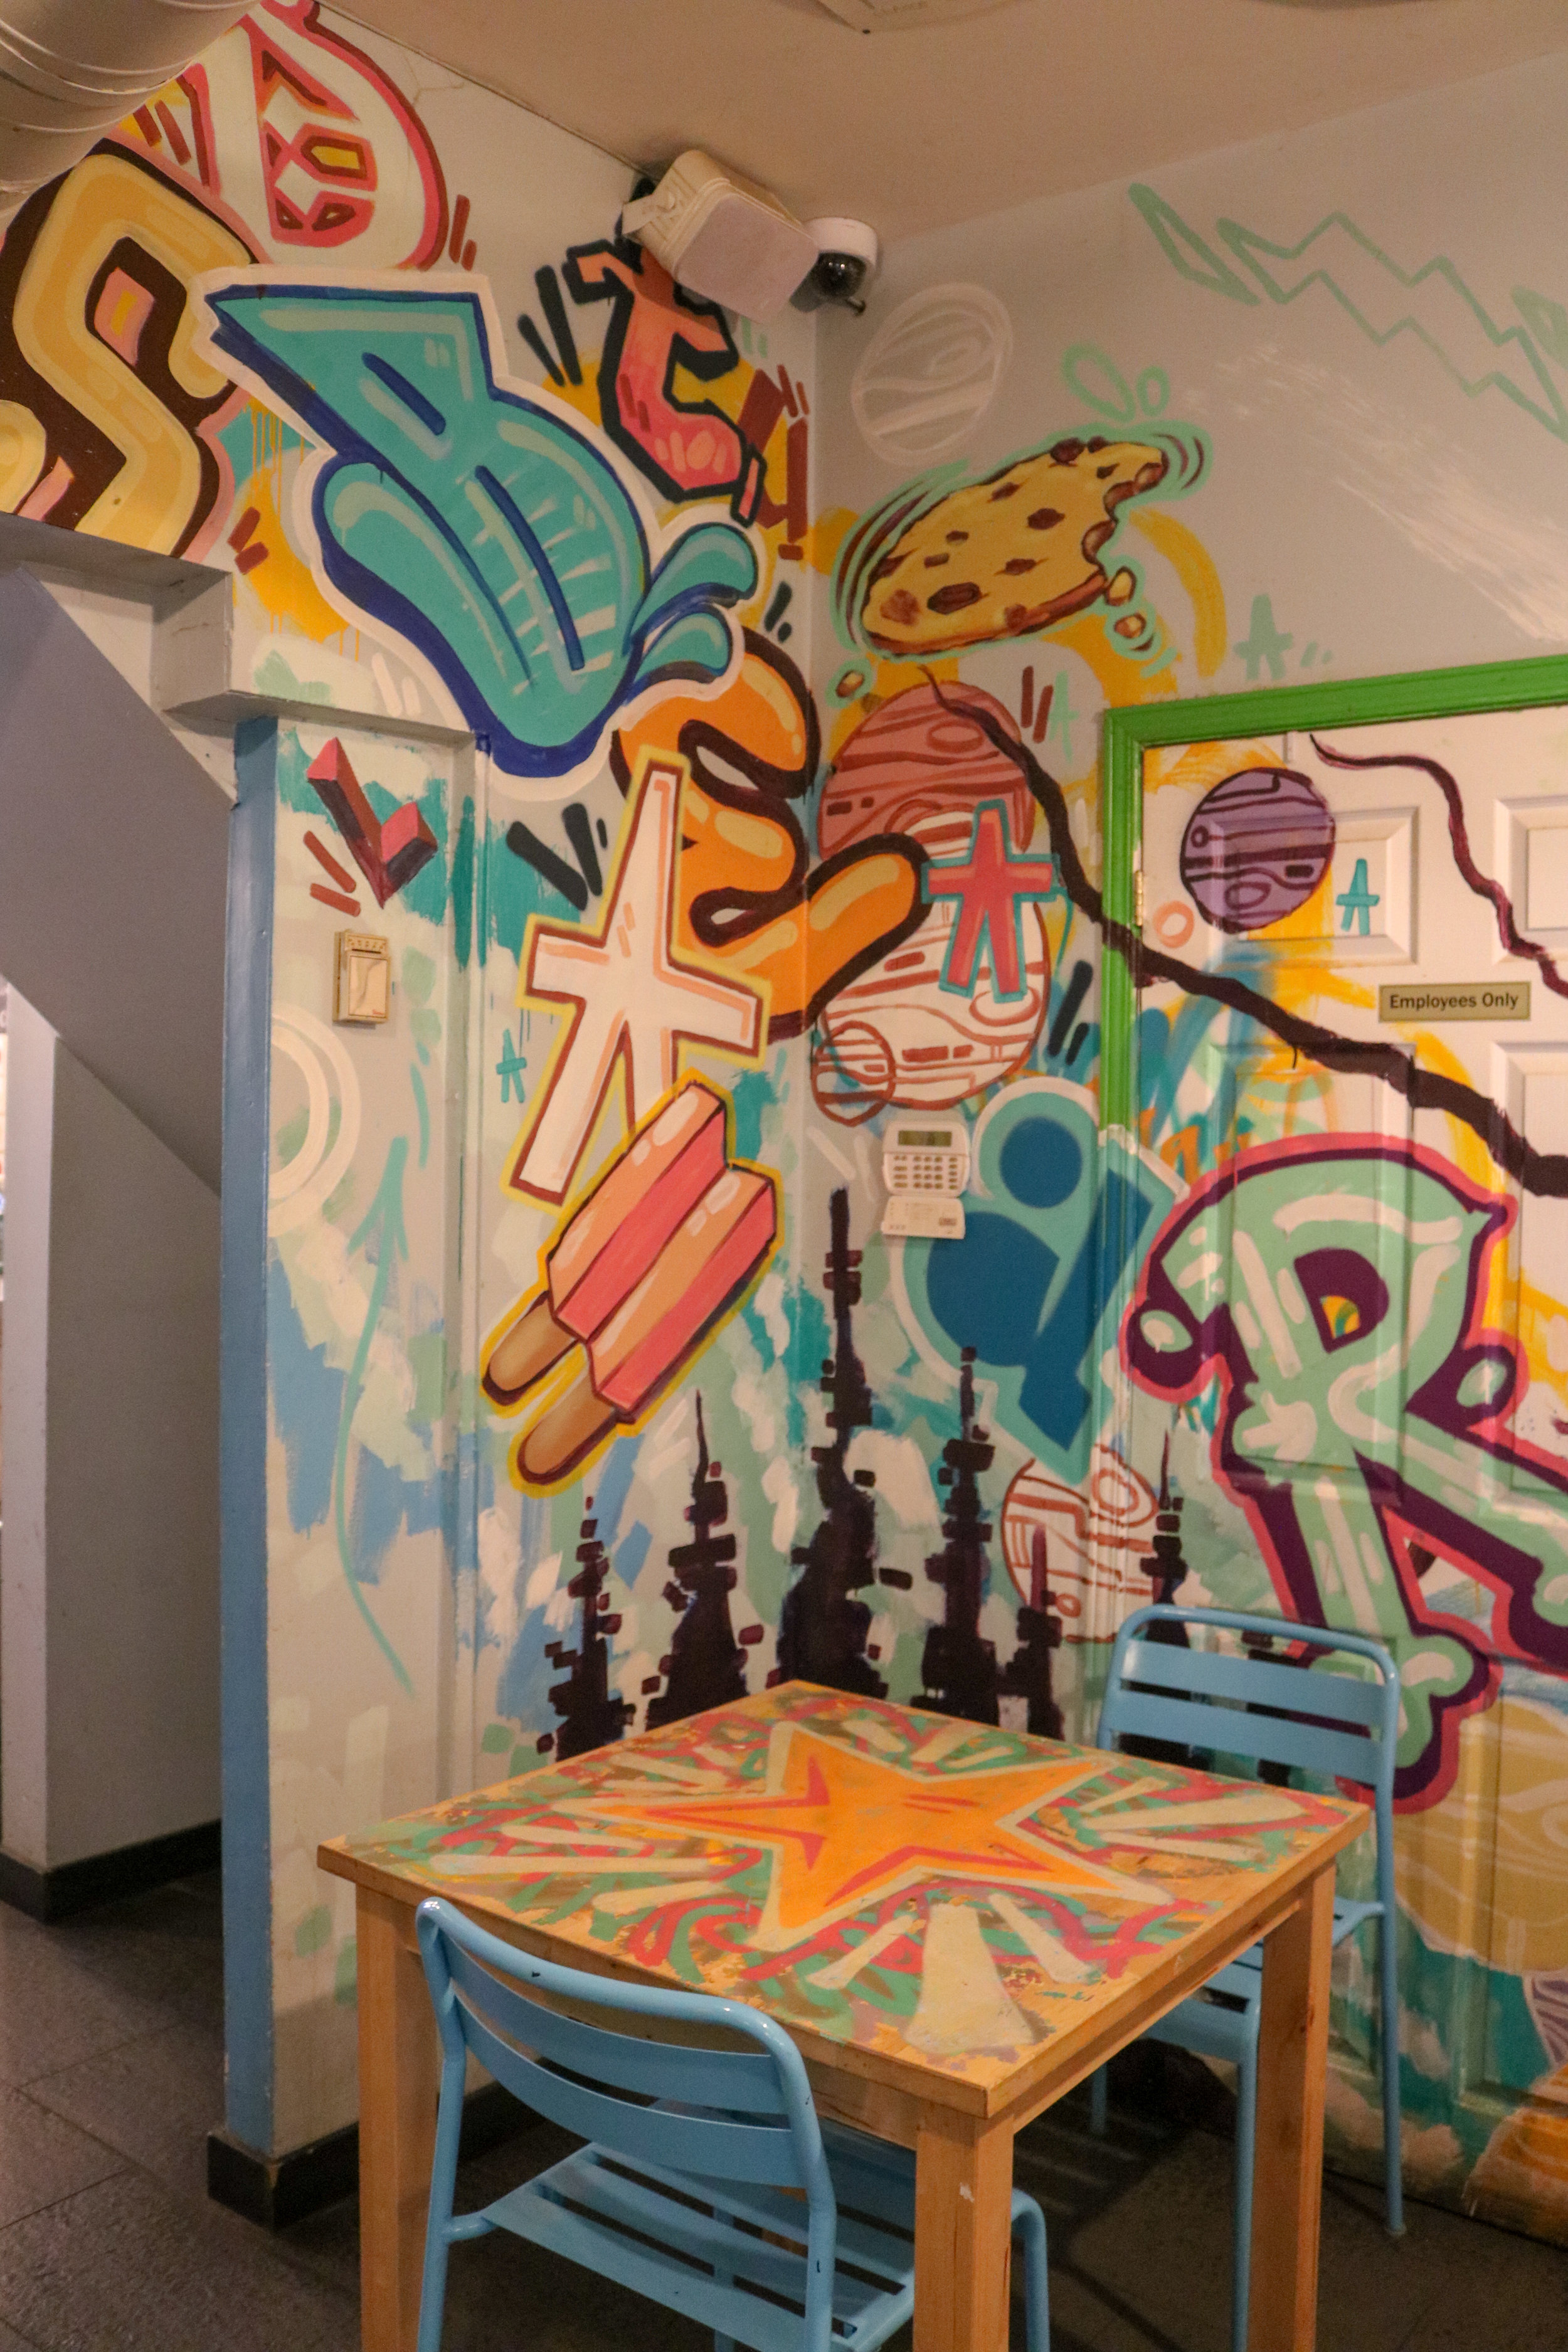 Cool wall art at De Mello